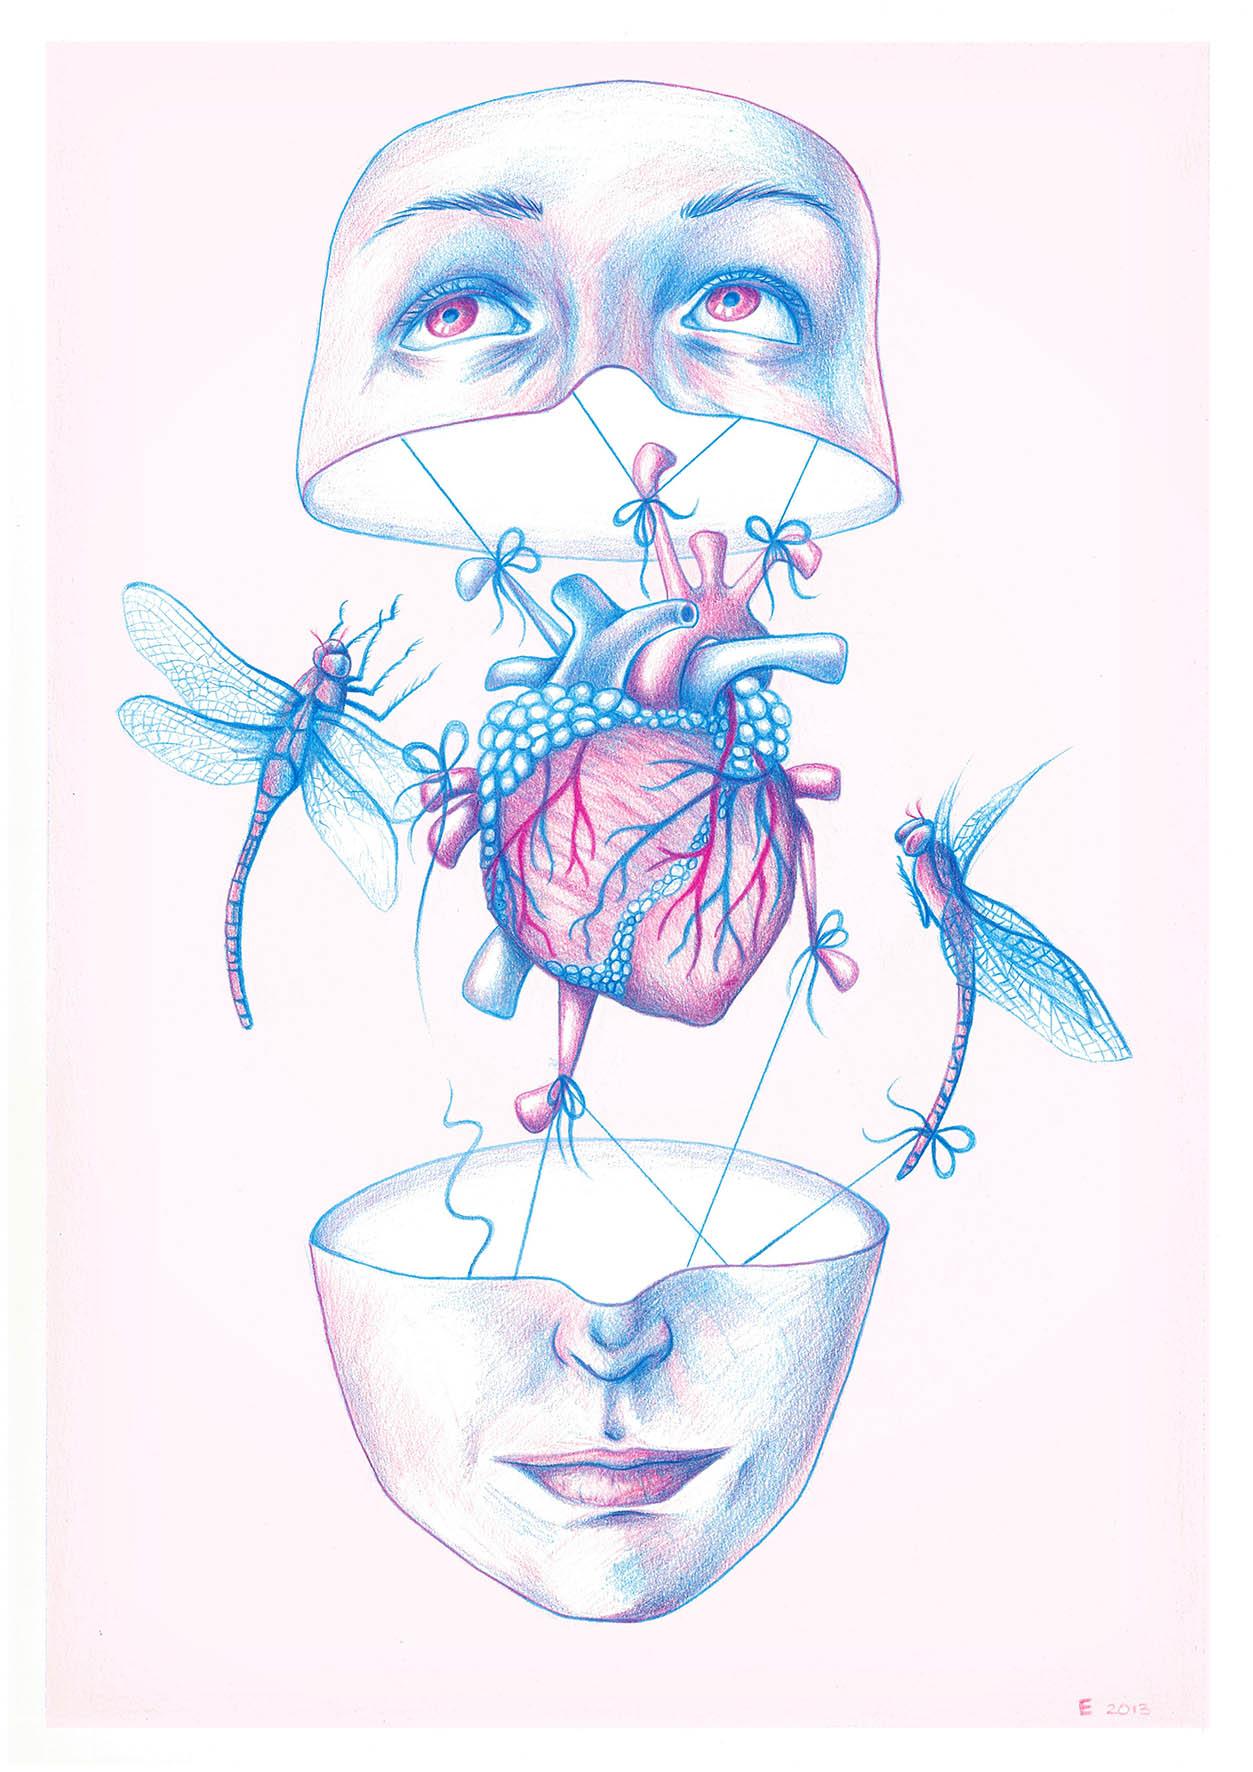 """Heart Strings"" by Miss E"